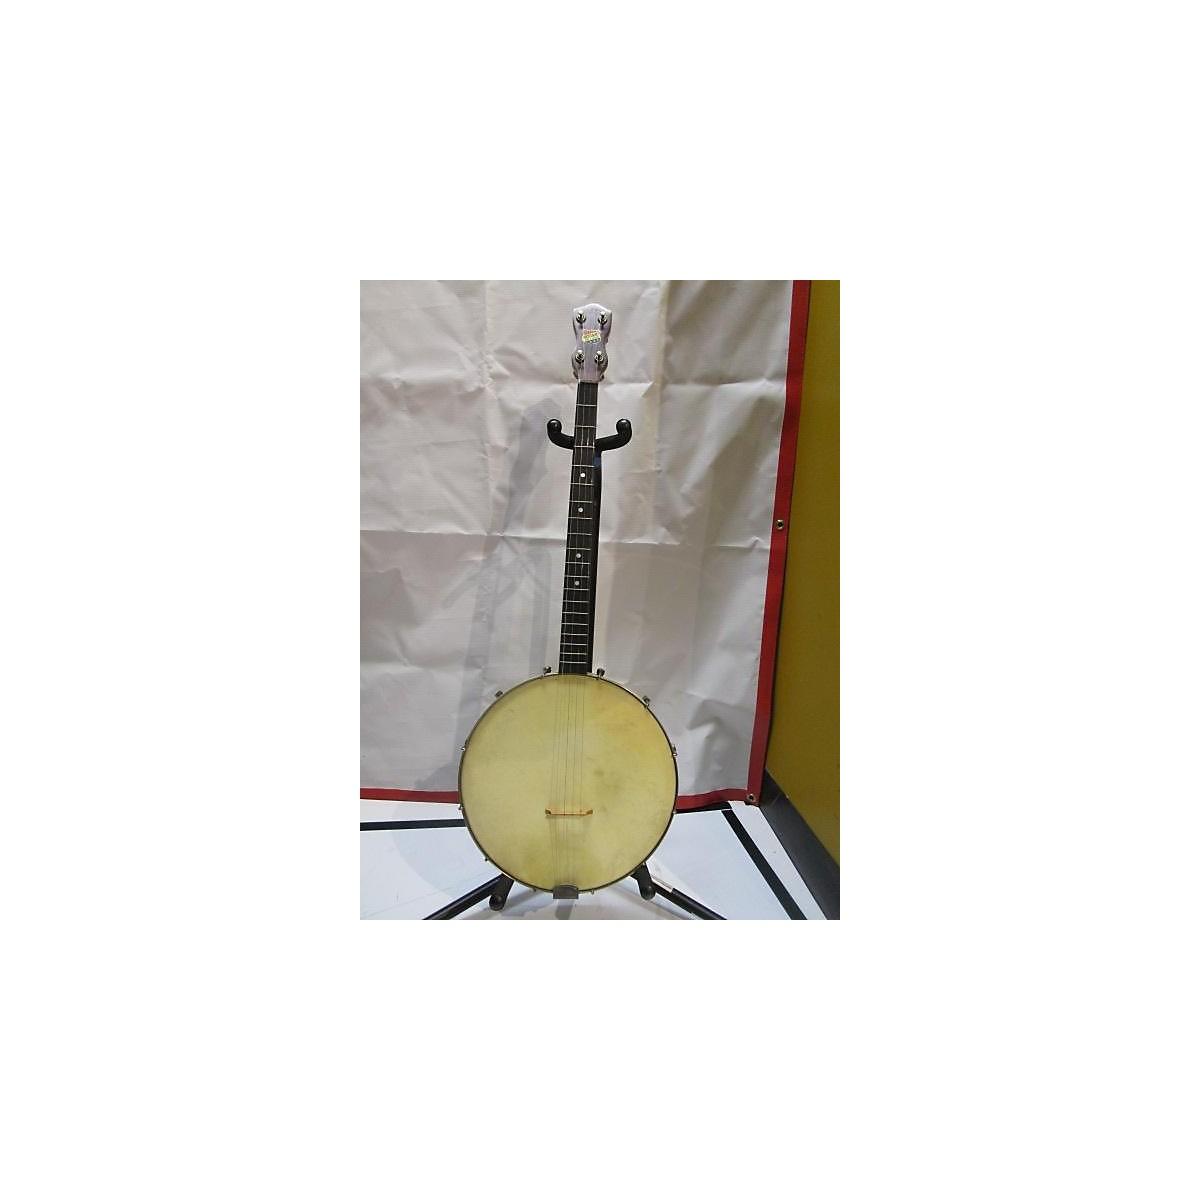 In Store Vintage Vintage 1960s Rotary Deluxe Banjo Natural Banjo